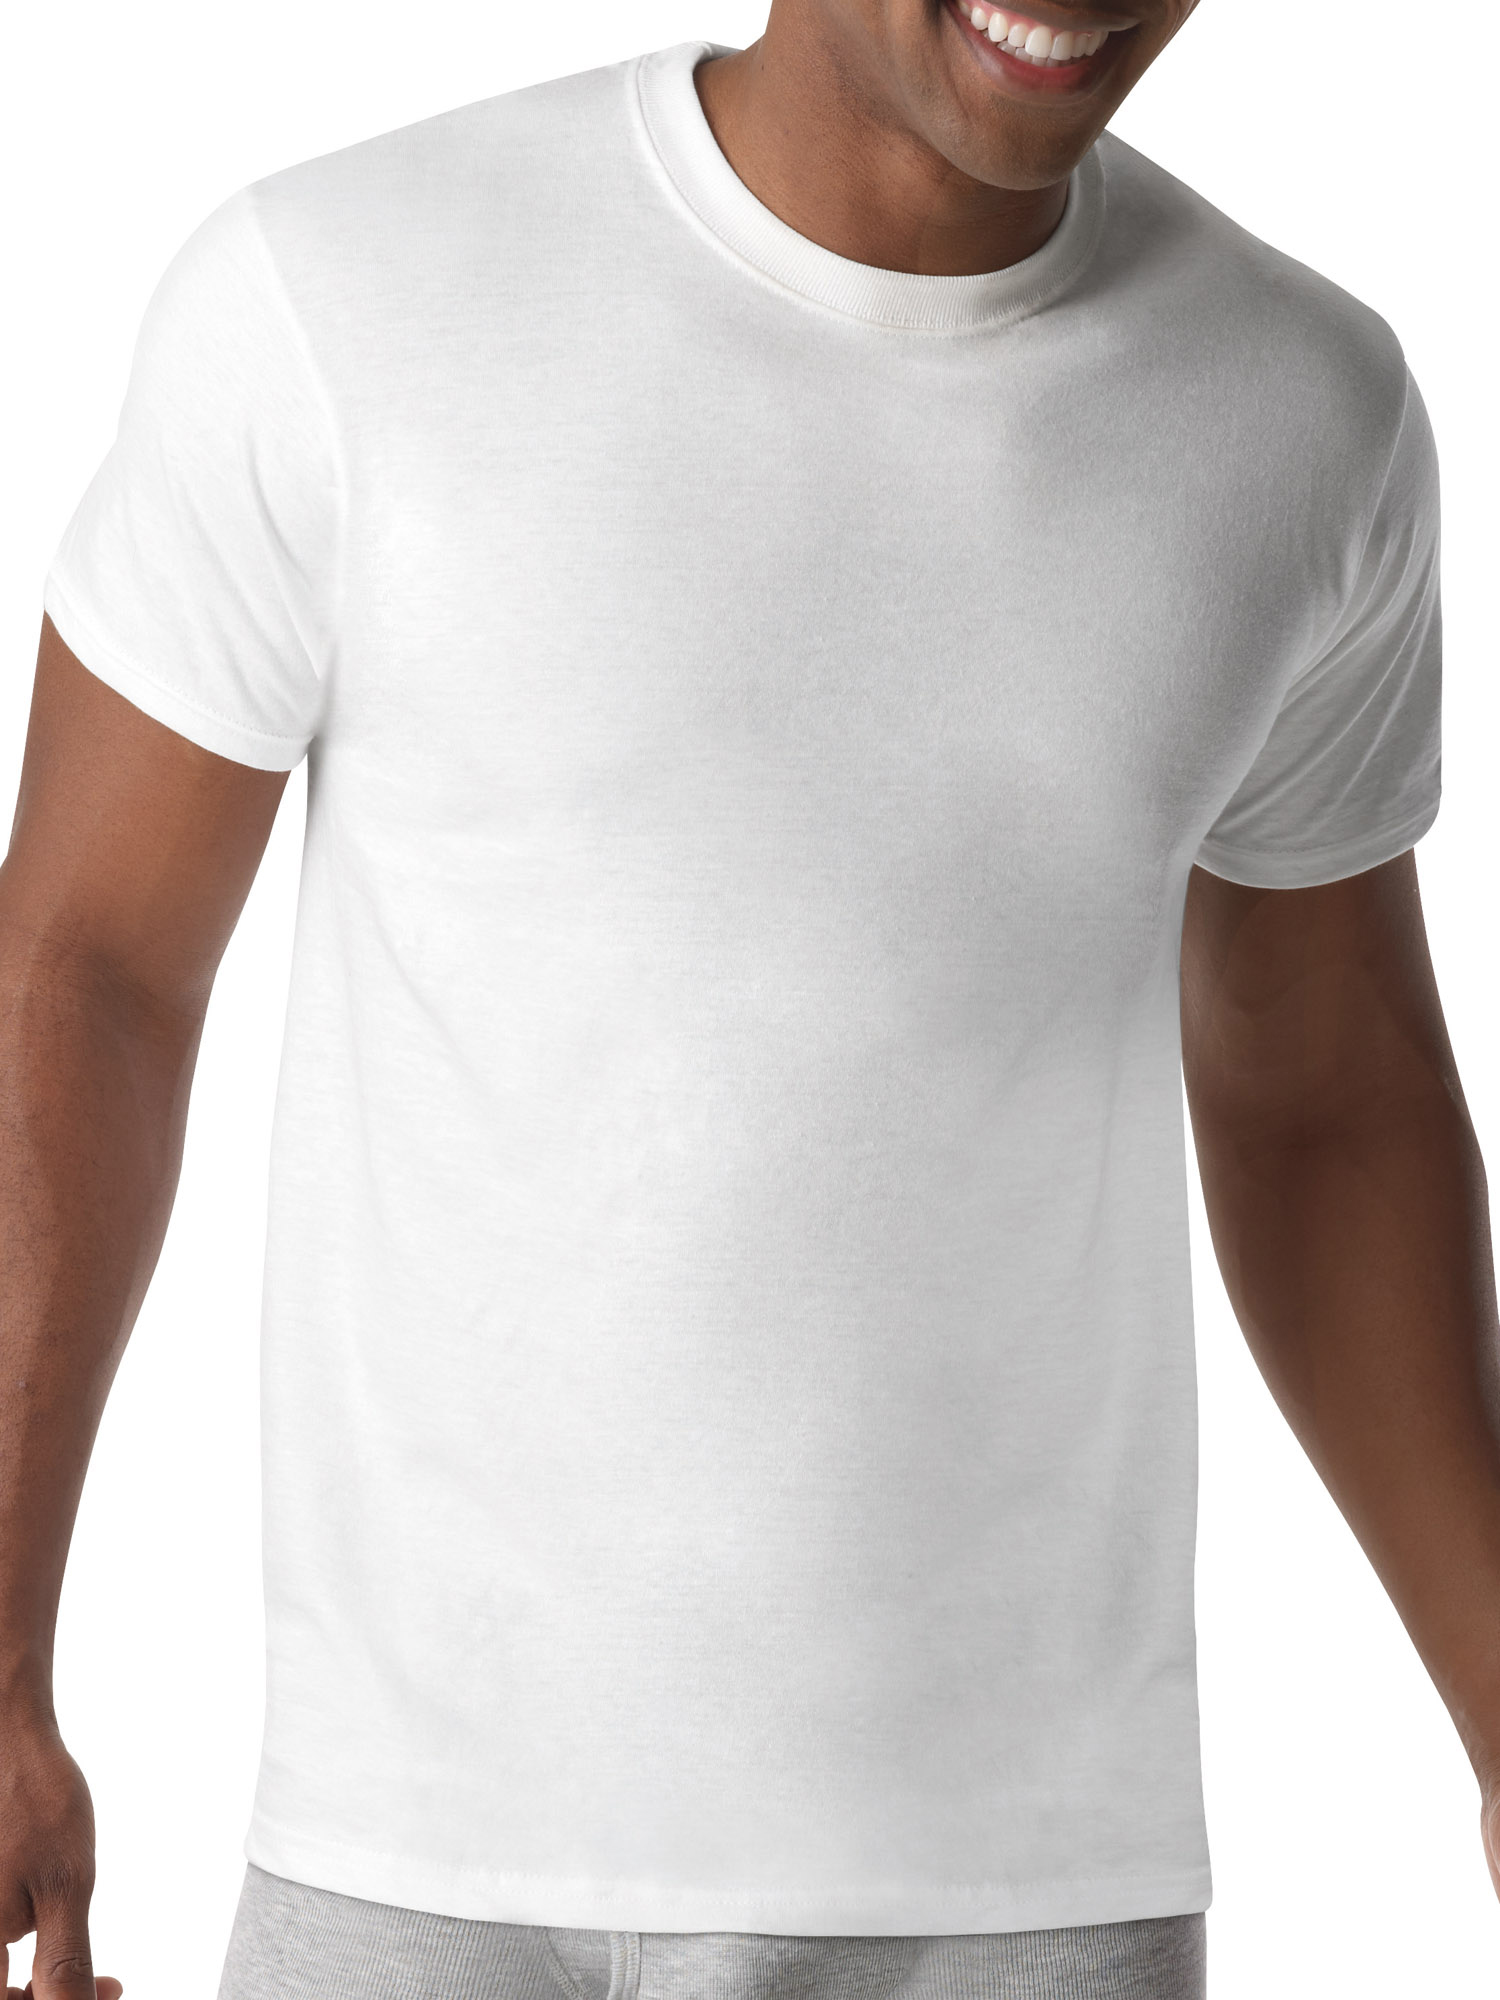 Mens ComfortBlend Tagless White Crew T-Shirts, 5 Pack